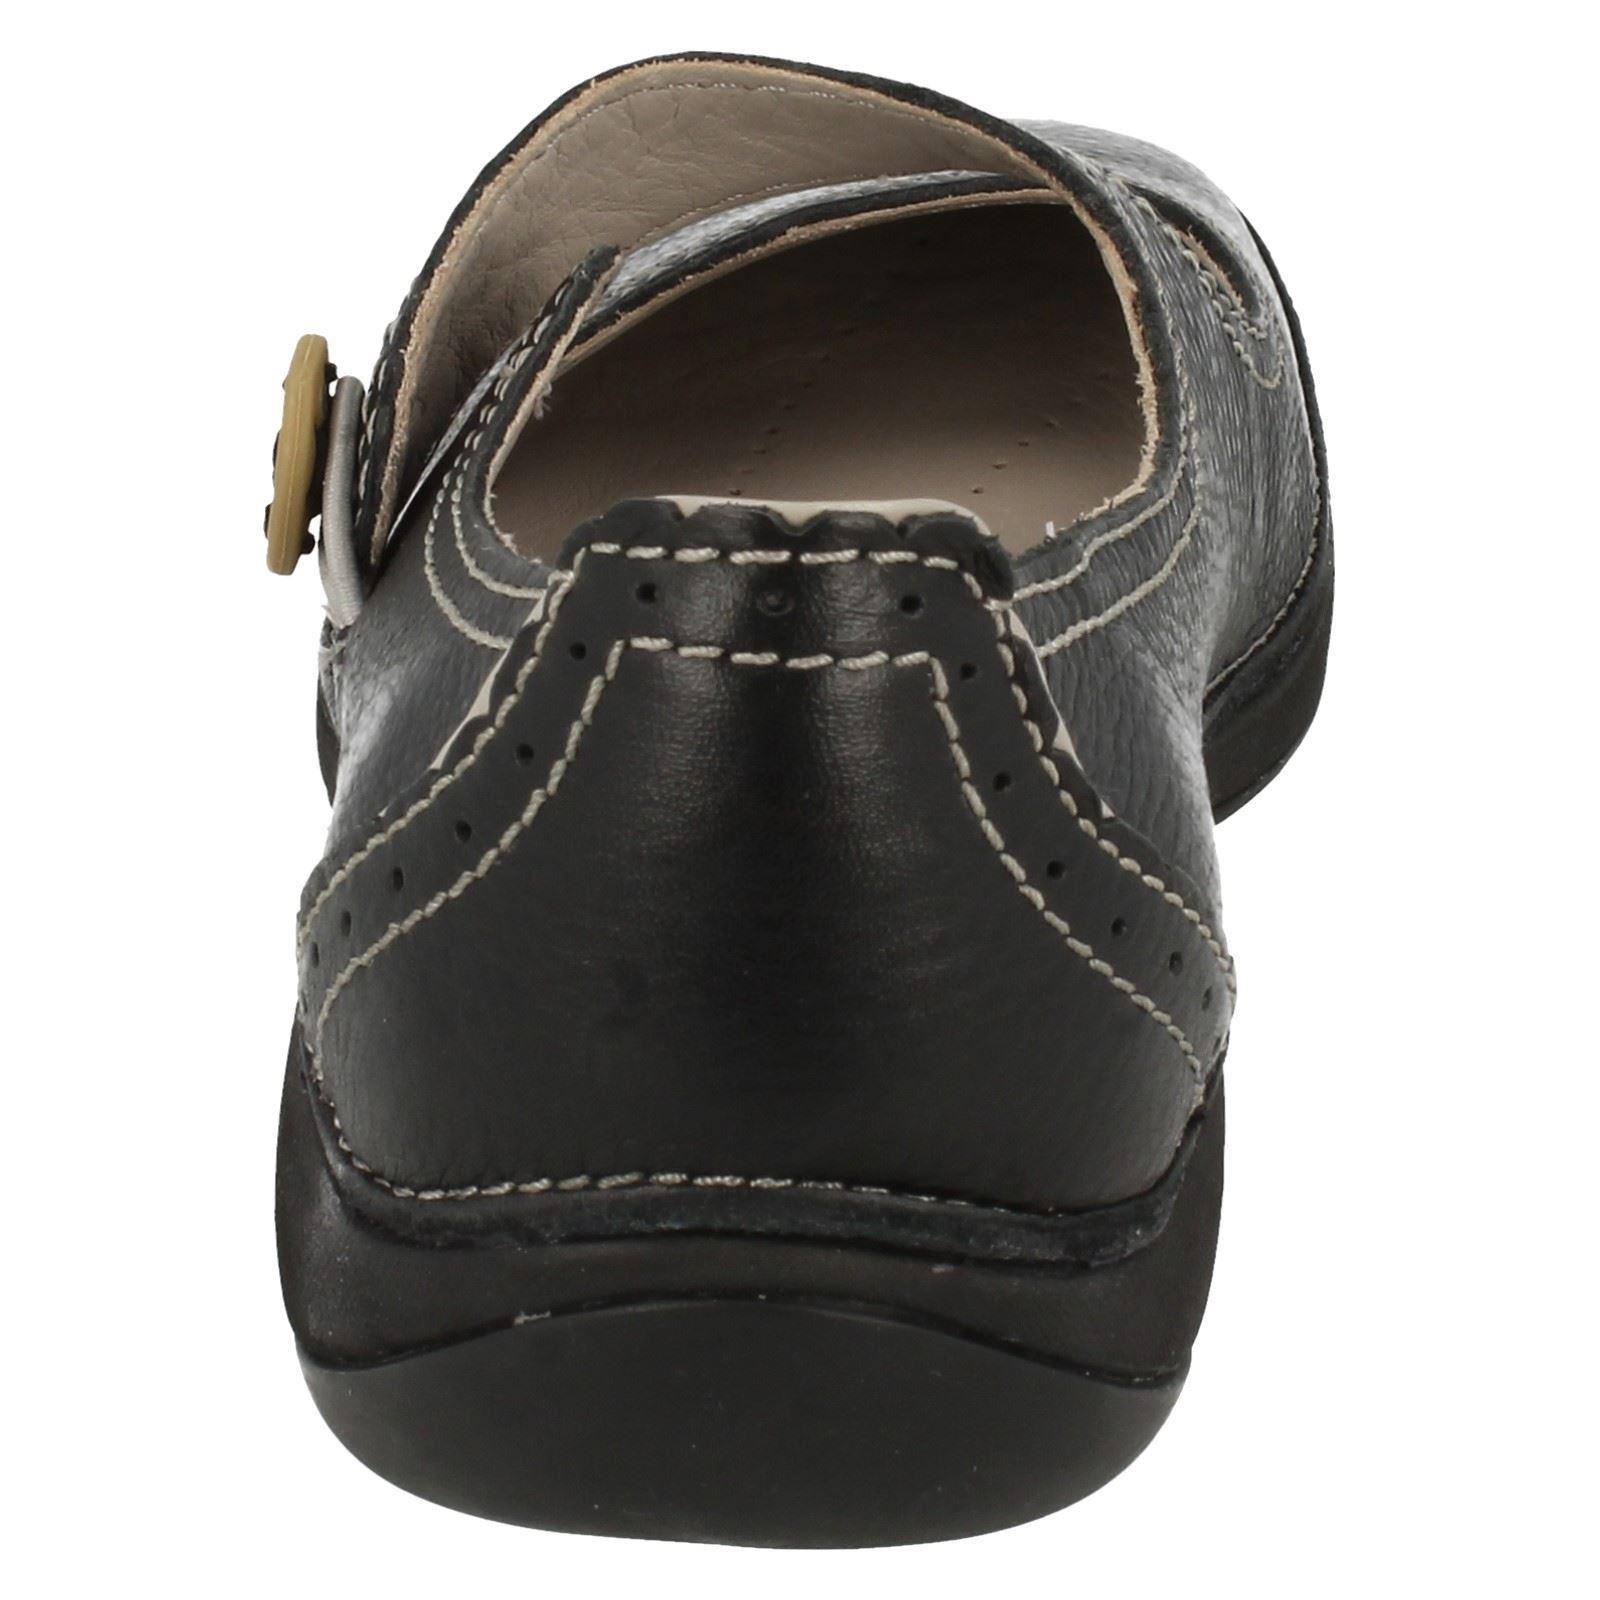 Lake Clarks Black activos Ladies Fairlie Air zapatos planos qqFOHp